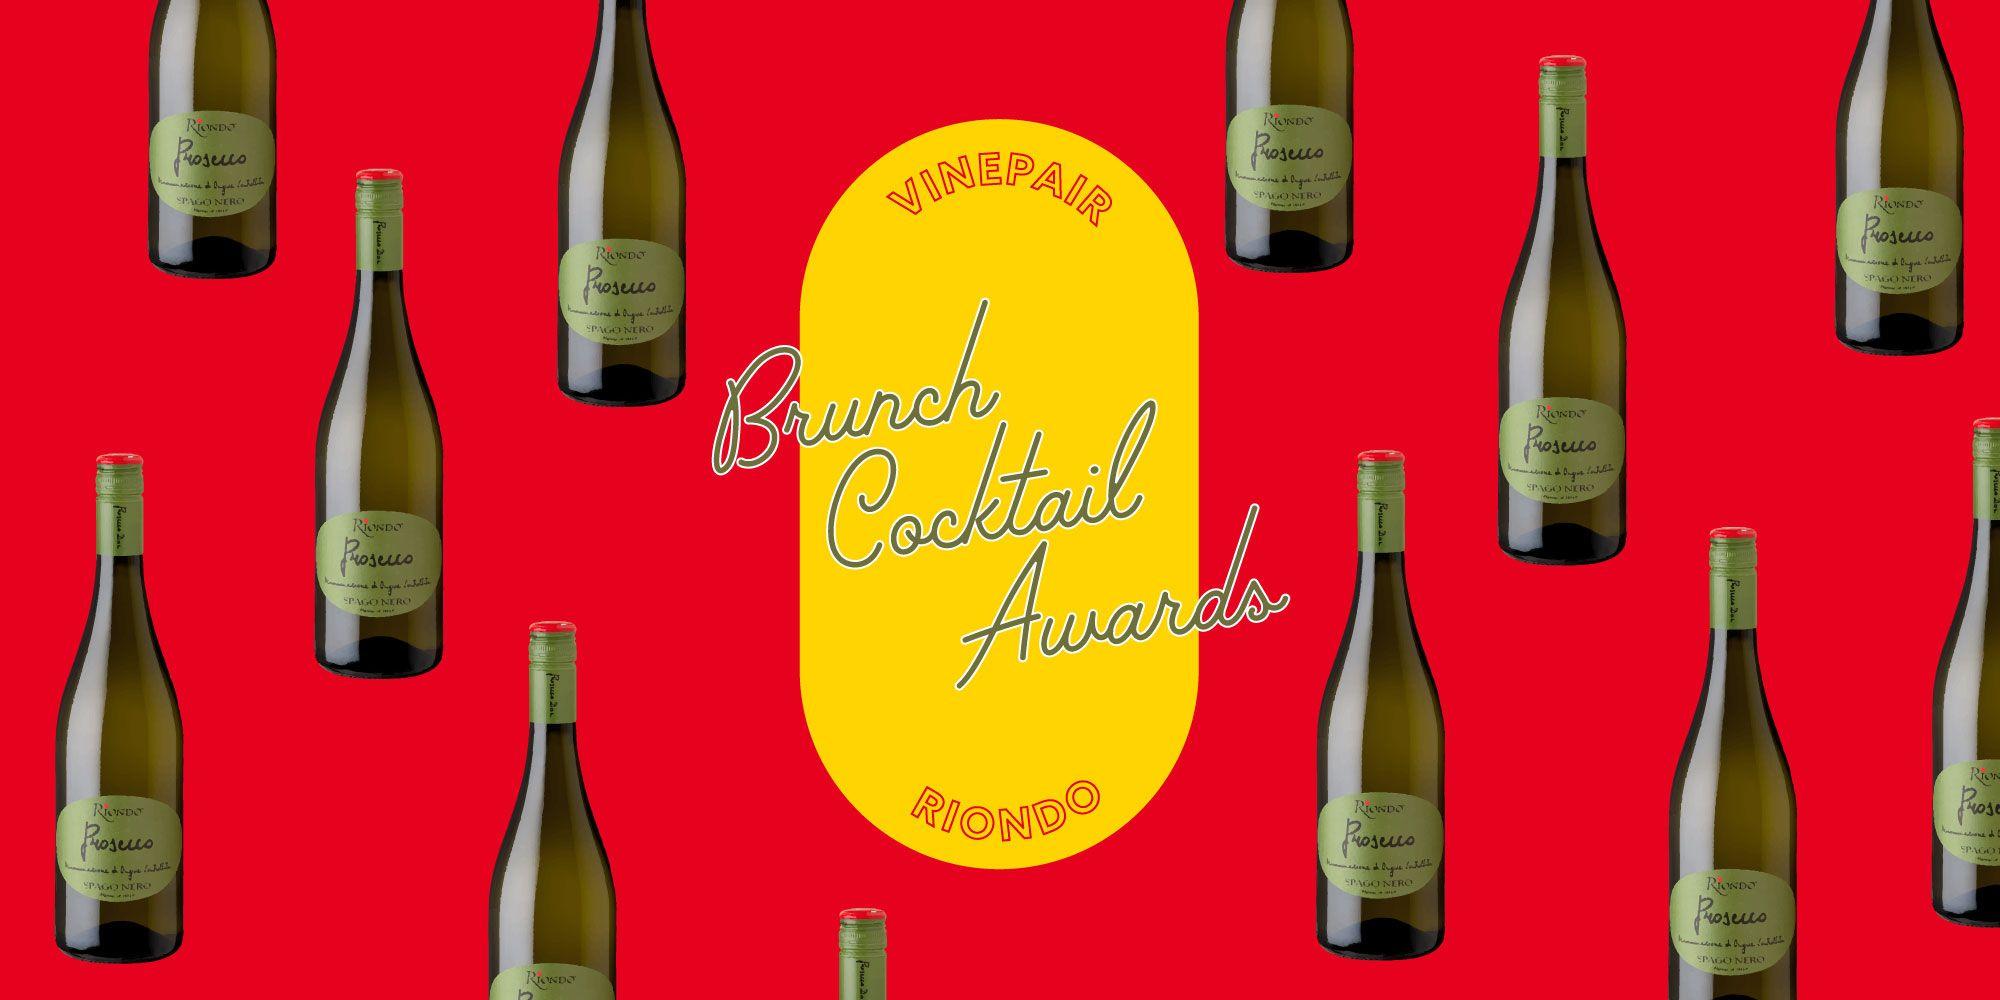 The Nation S 10 Best Brunch Cocktail Programs 2019 Brunch Cocktails Cocktails Brunch